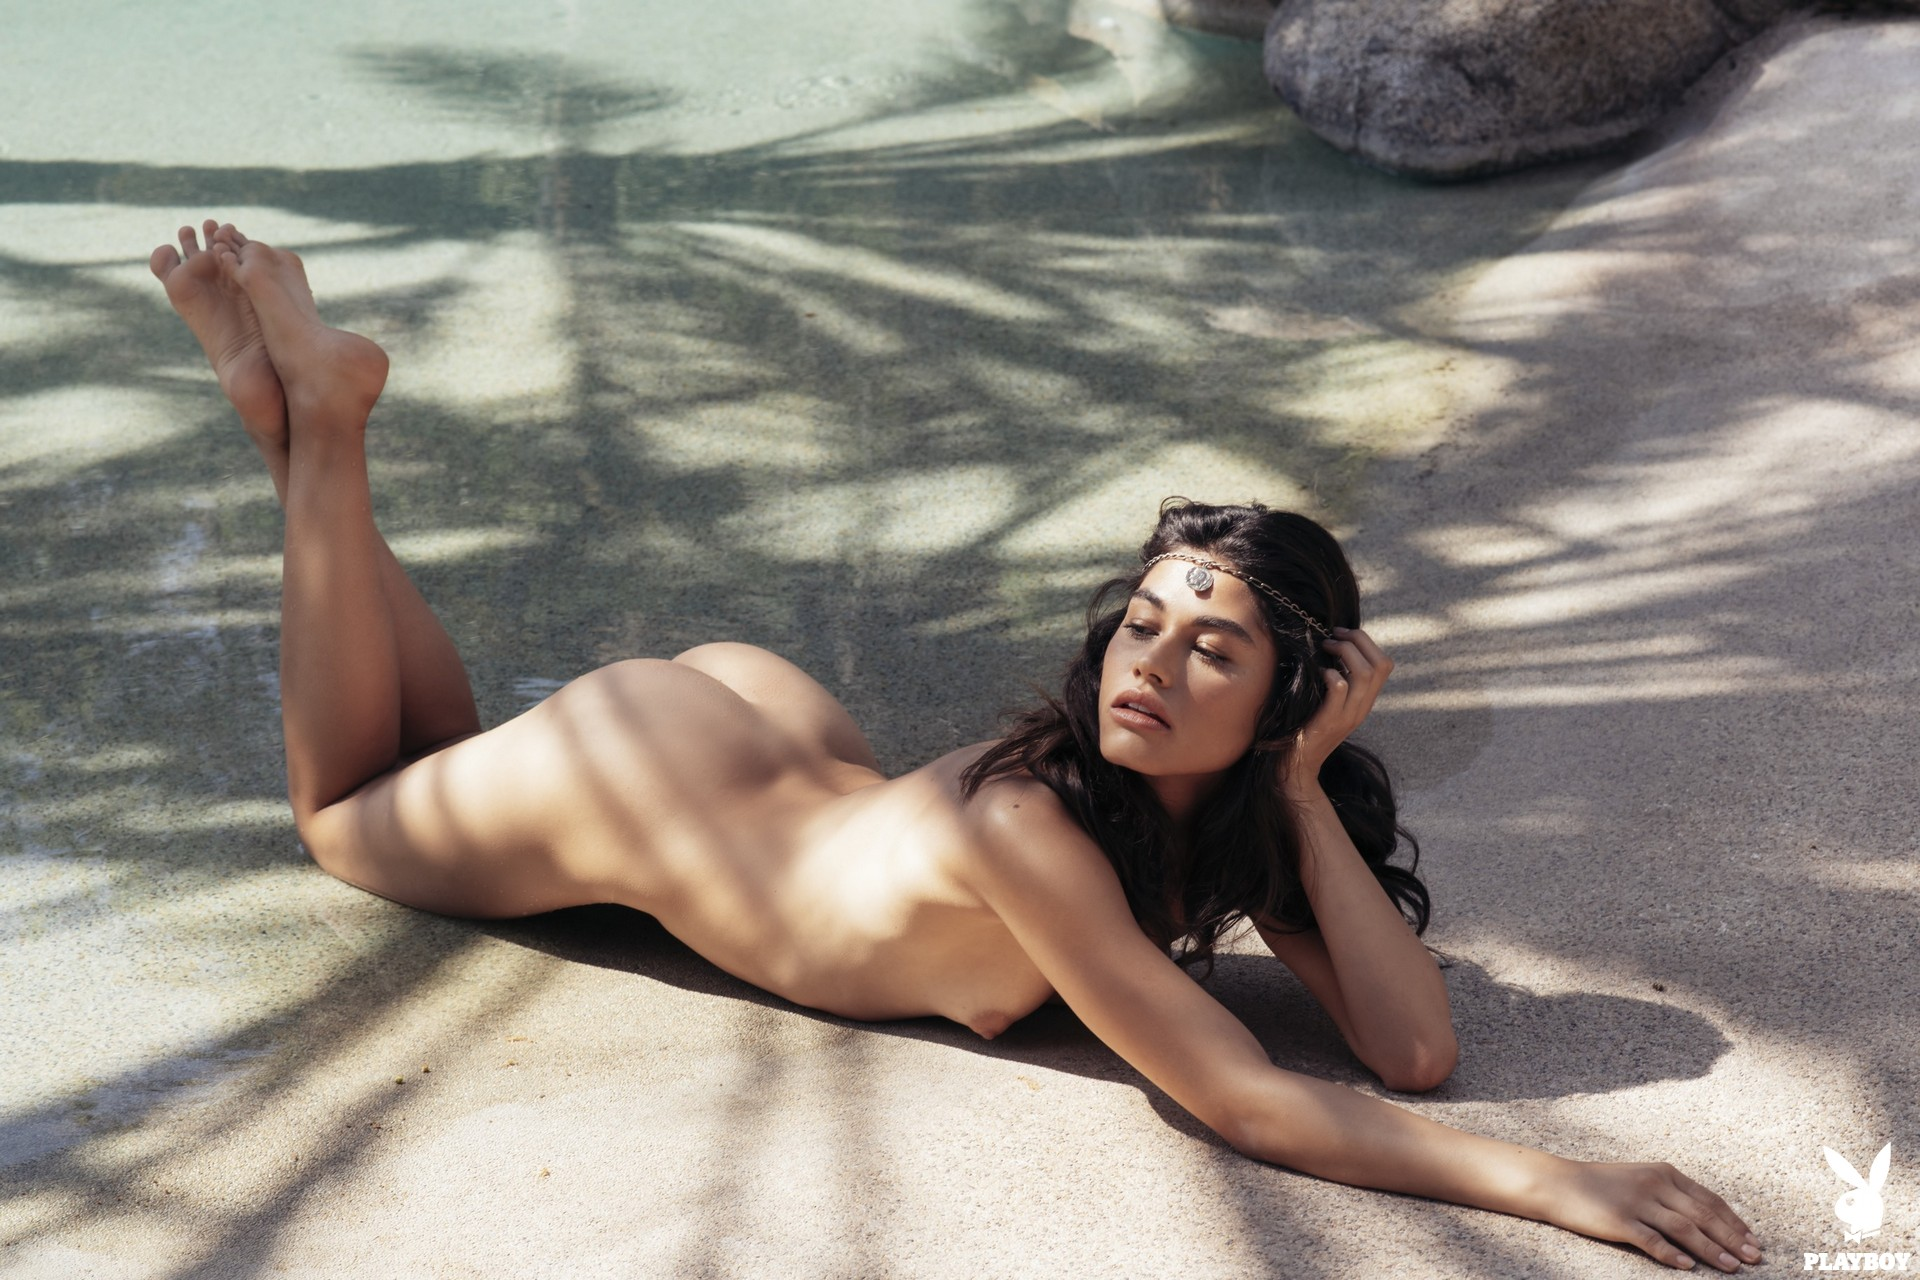 Playmate August 2018: Lorena Medina - Playboy Plus 20